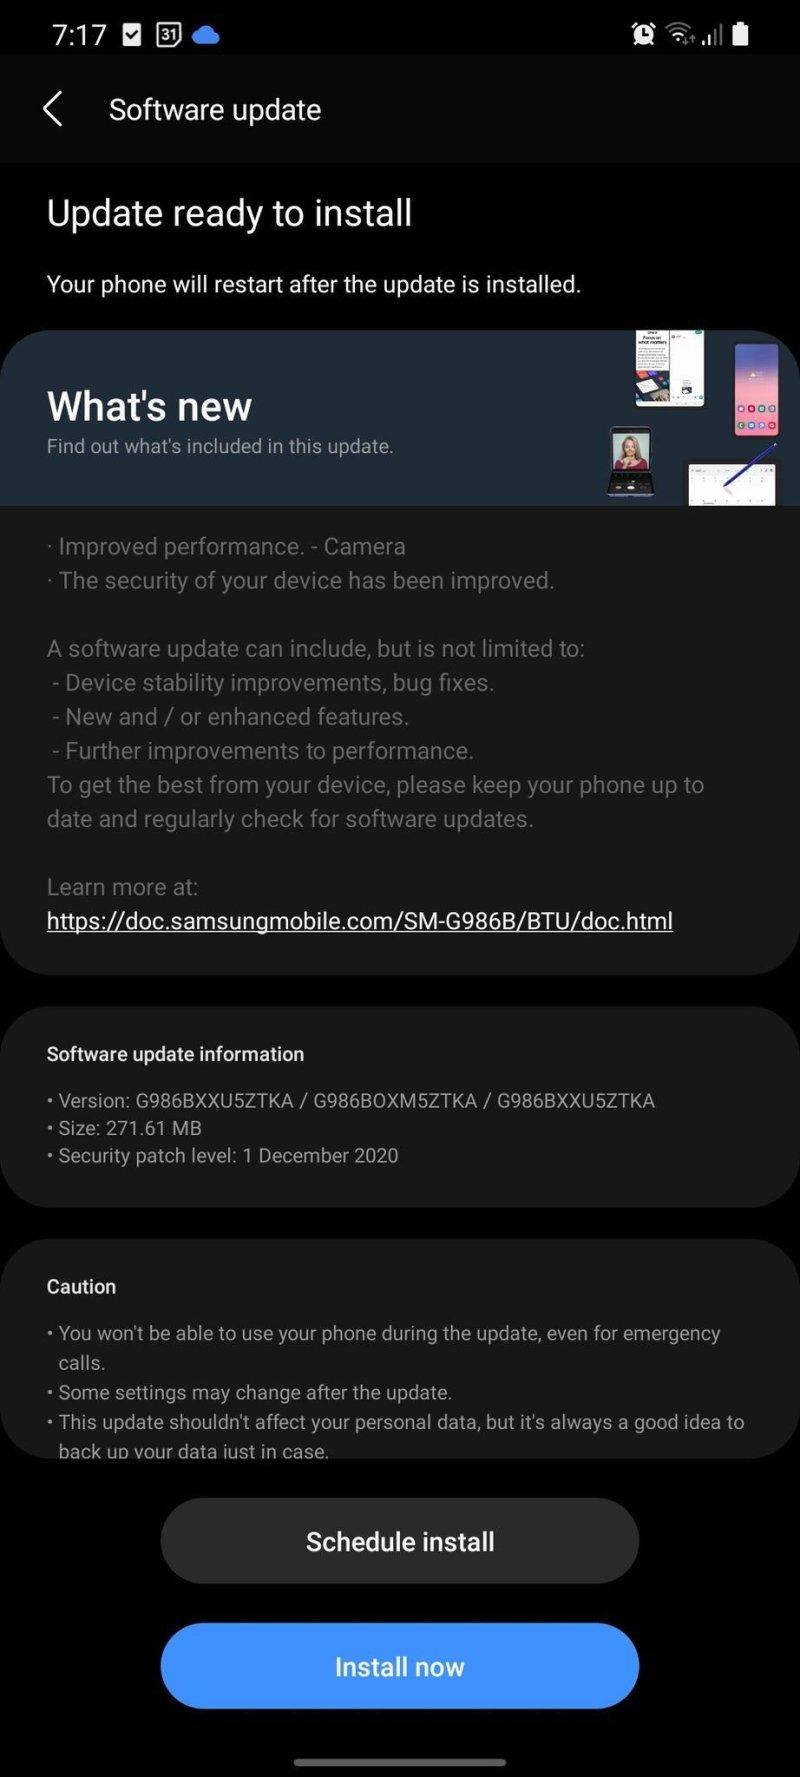 Samsung Galaxy S20 One Ui 30 Beta 4 Uk